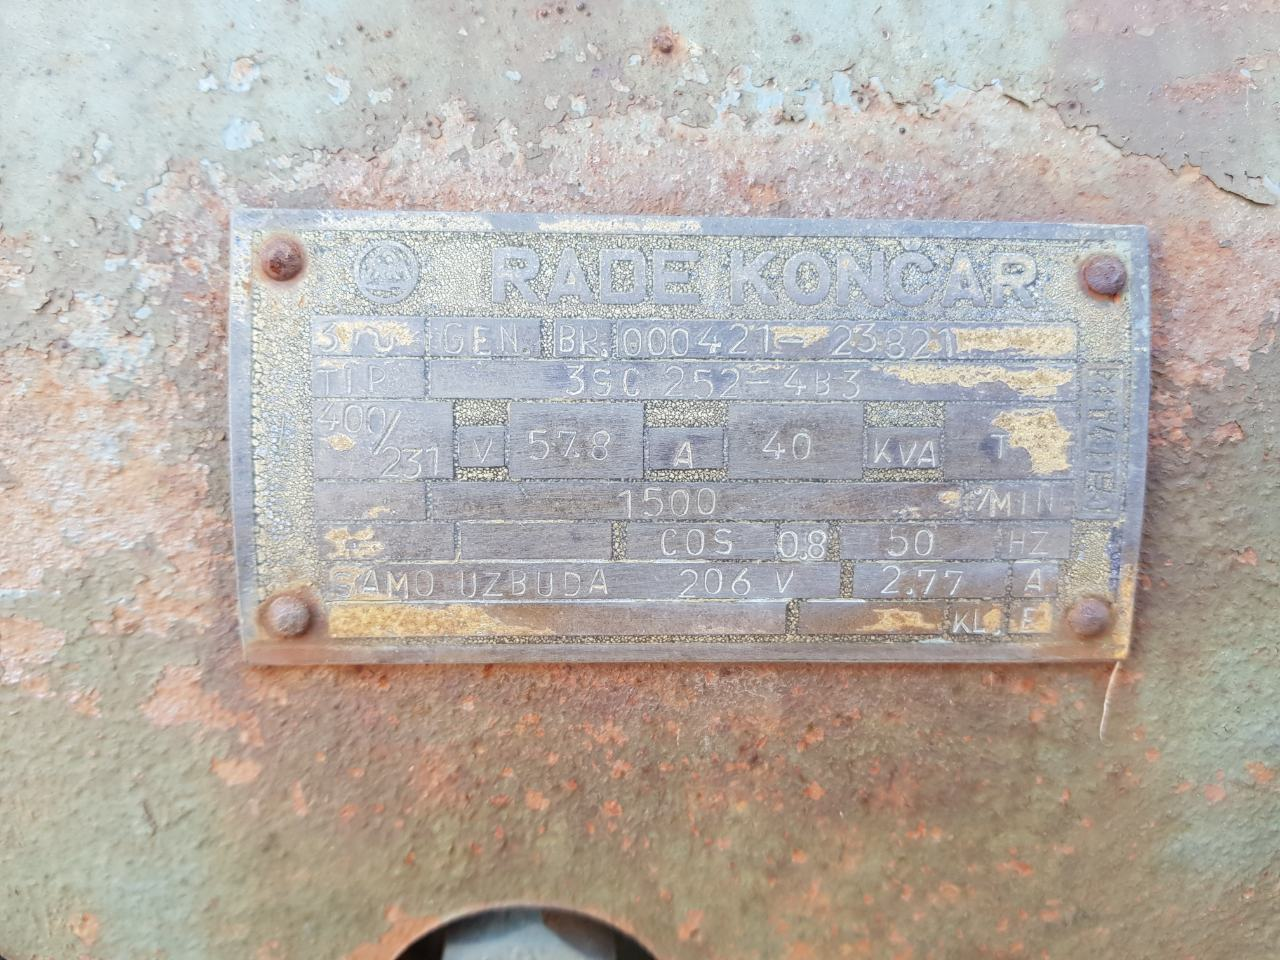 Agregat za remont, Torpedo, Rade Končar